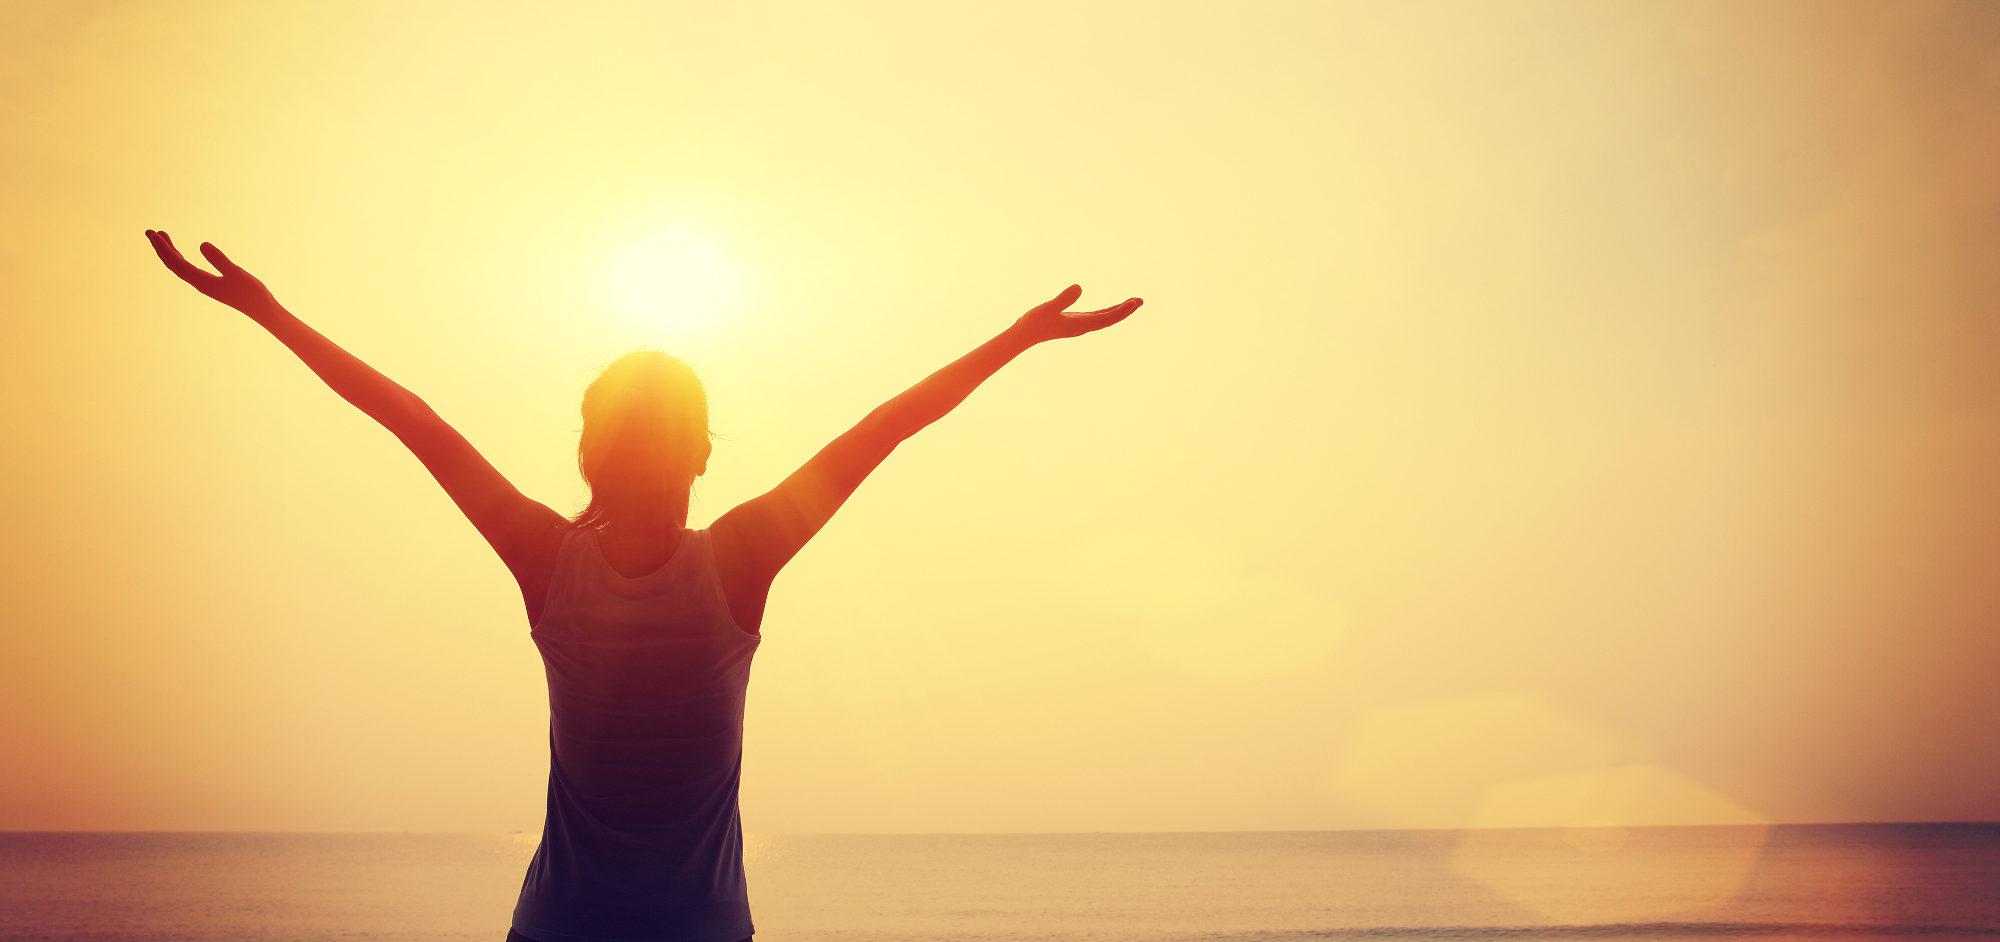 Ando Preferindo Ter Paz Do: Para Ter Serenidade E Paz De Espírito